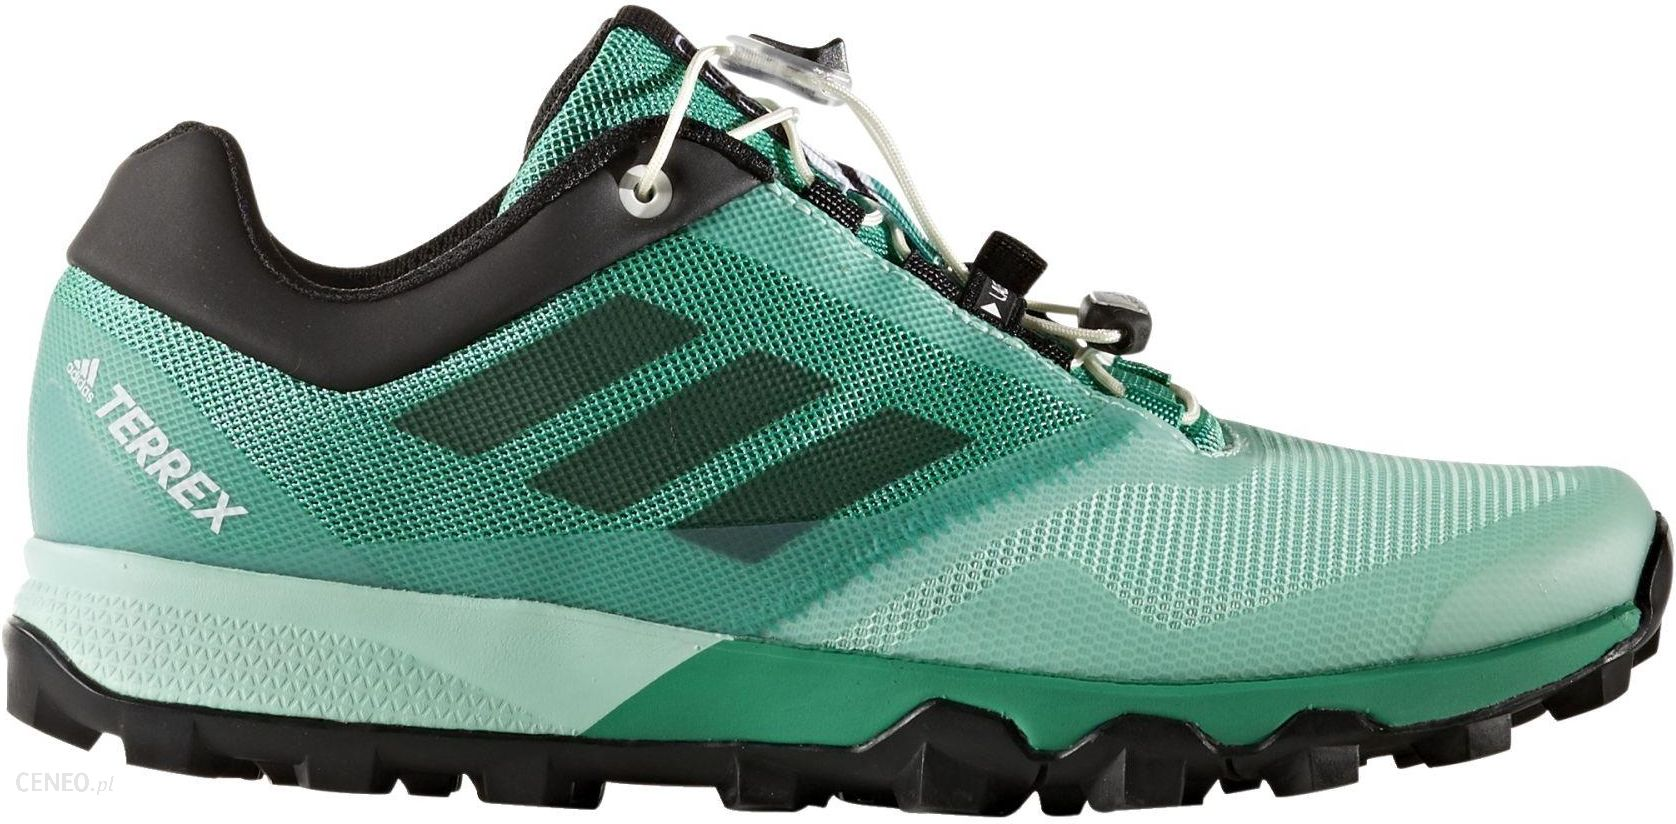 big sale cfddb eda76 Adidas Buty Terrex TRailmaker W Core Green Core BlackEasy Green - zdjęcie  1